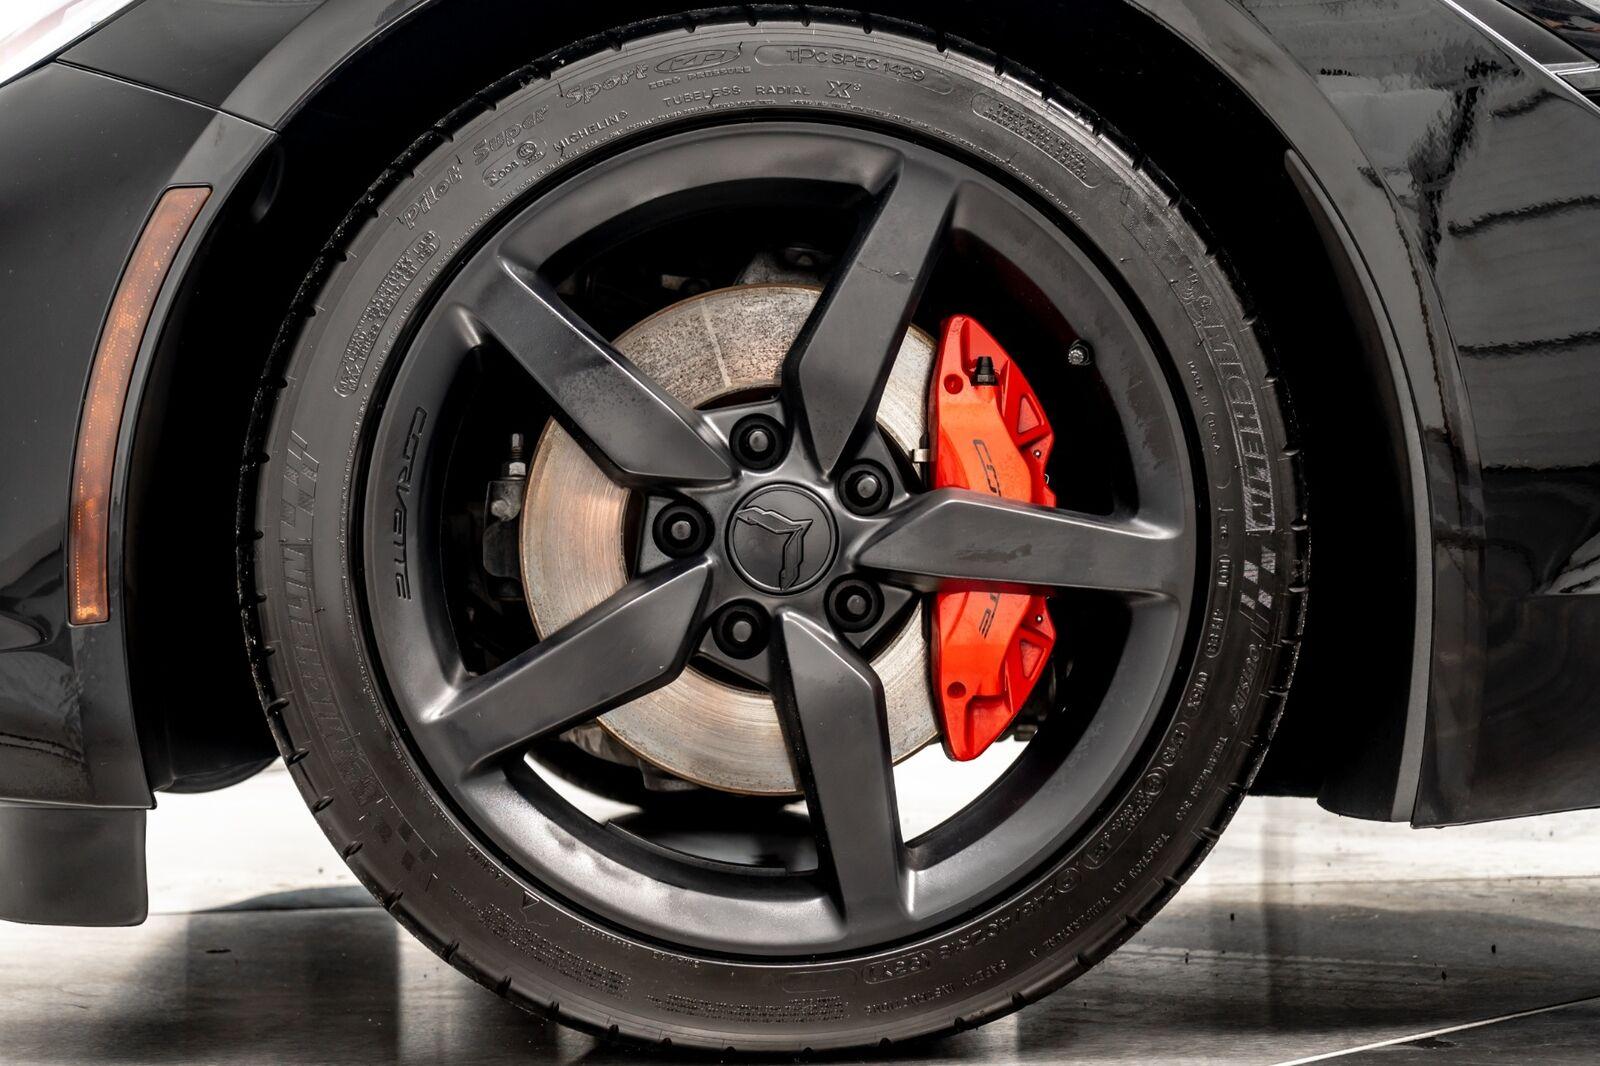 2014 Black Chevrolet Corvette Convertible 2LT   C7 Corvette Photo 9